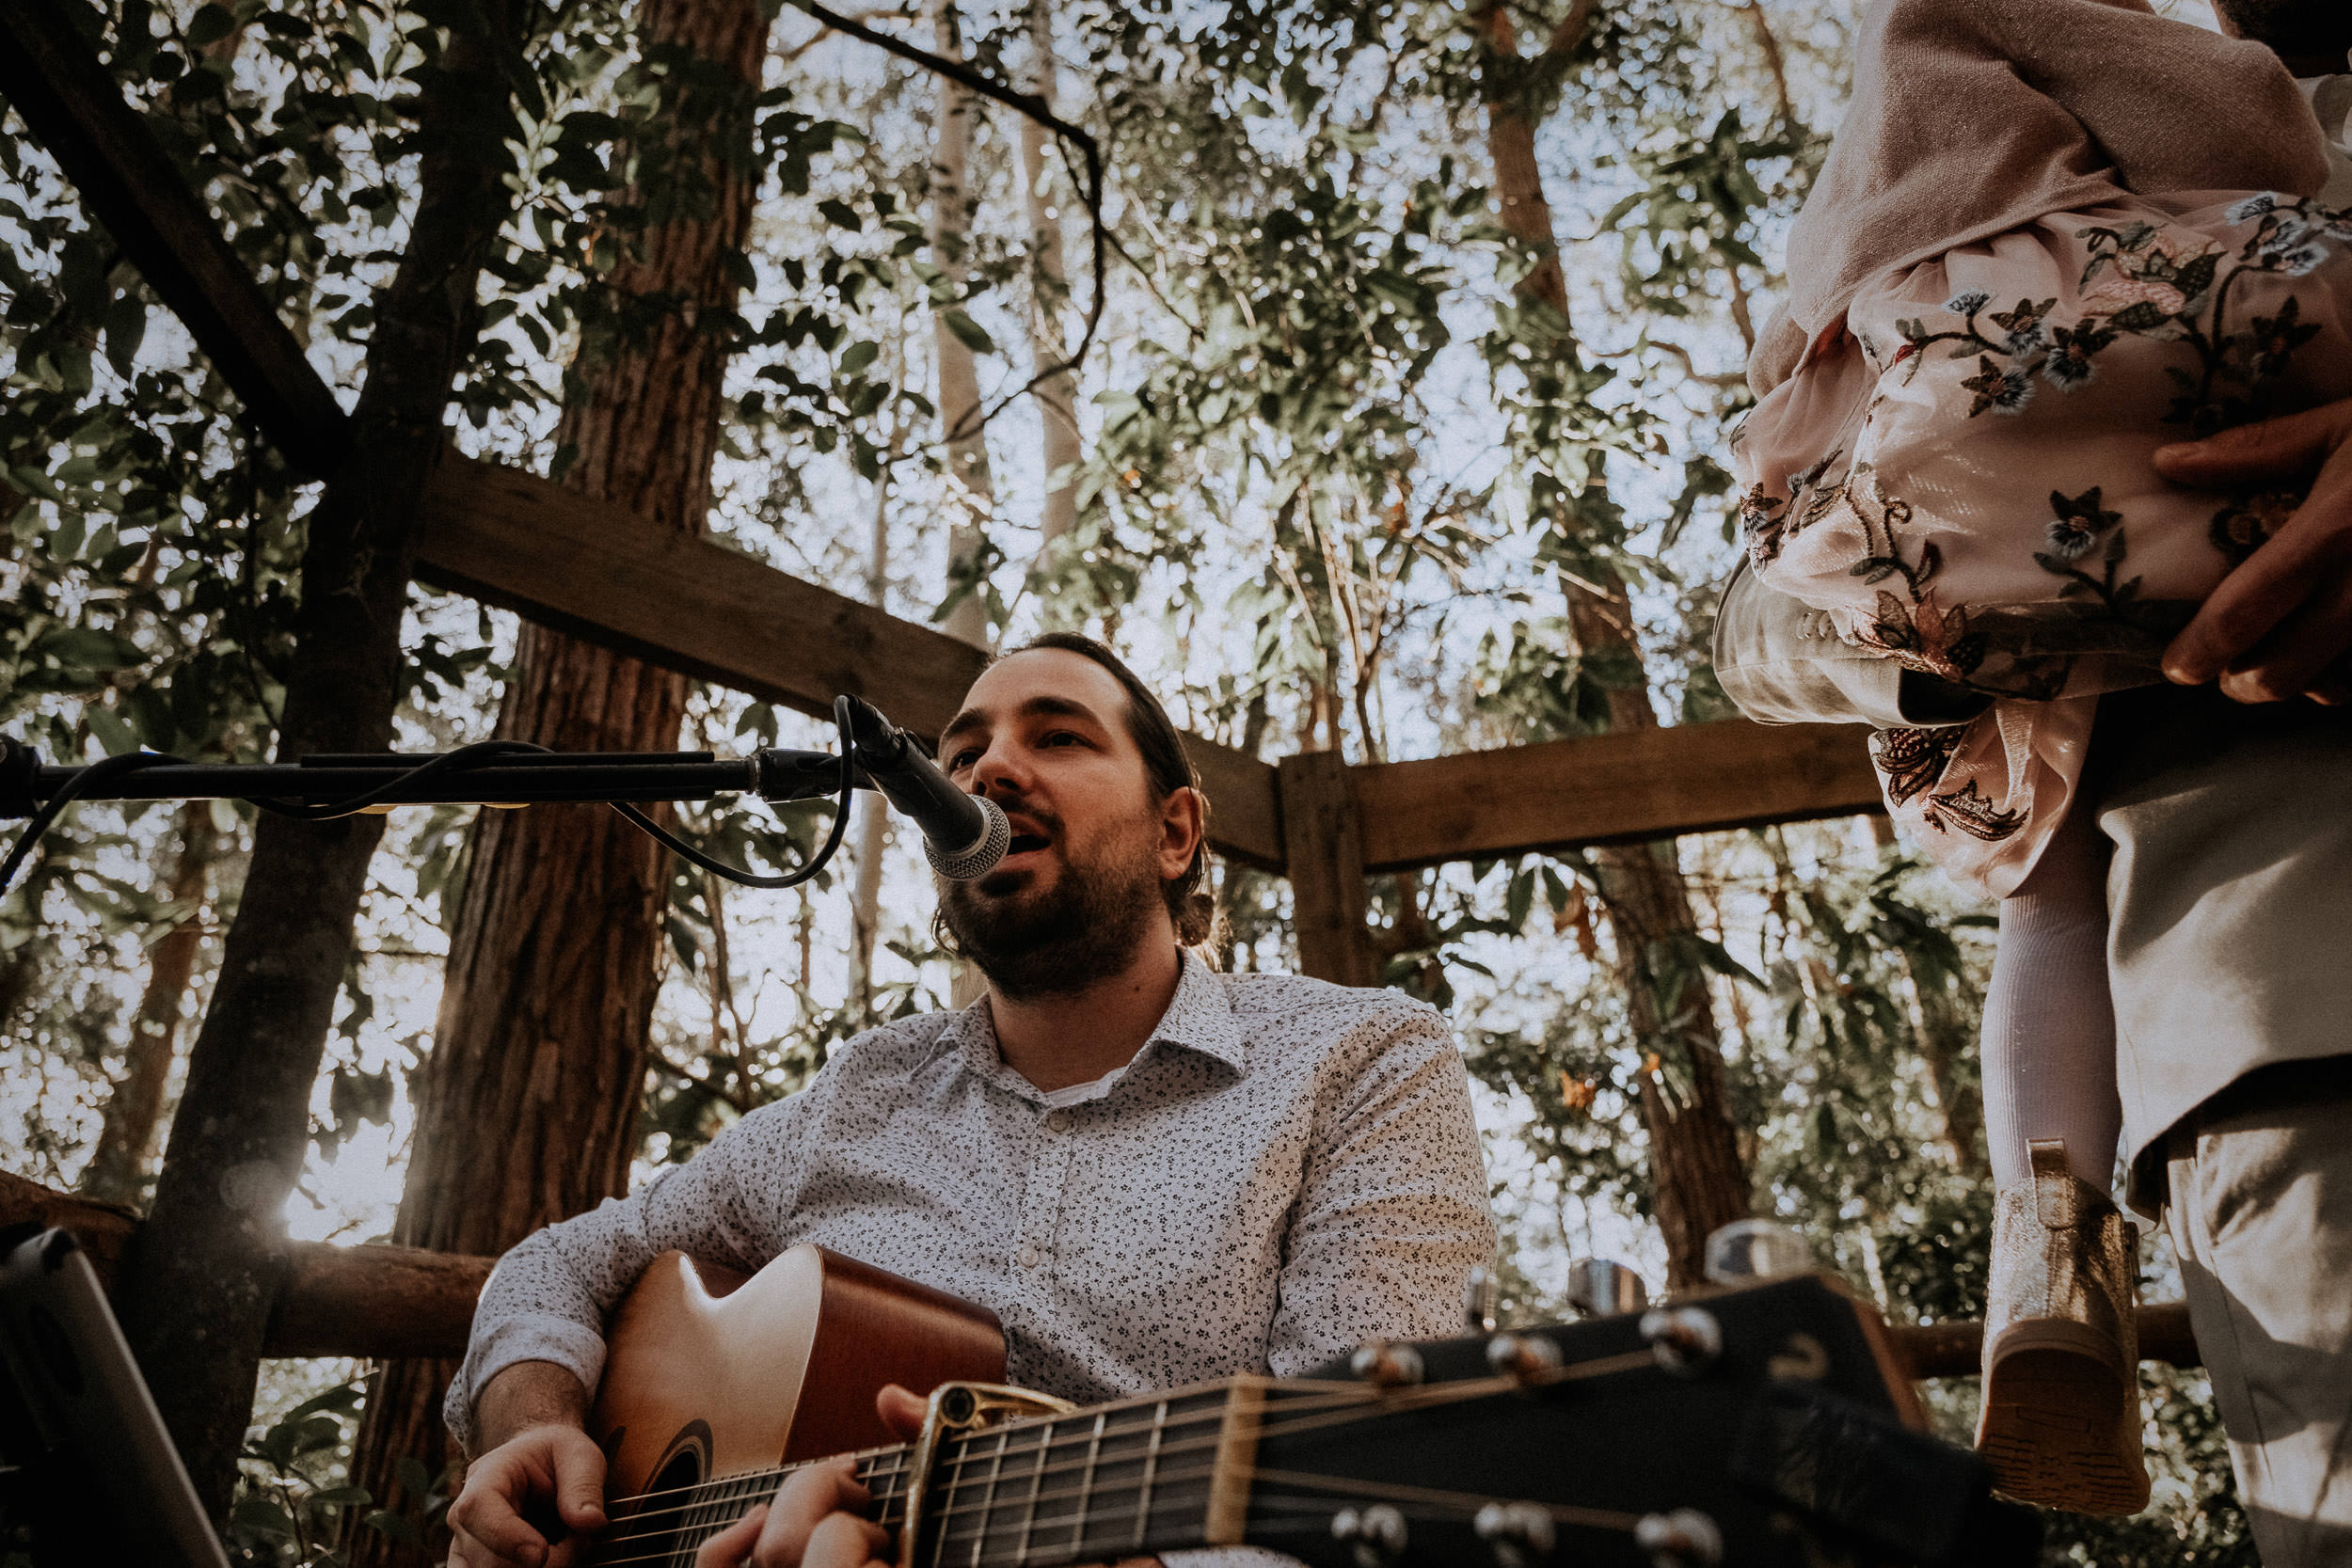 S&A Elopement - Kings & Thieves - Shred 'Til Dead - Central Coast Beach Forest Wedding - 275.jpg